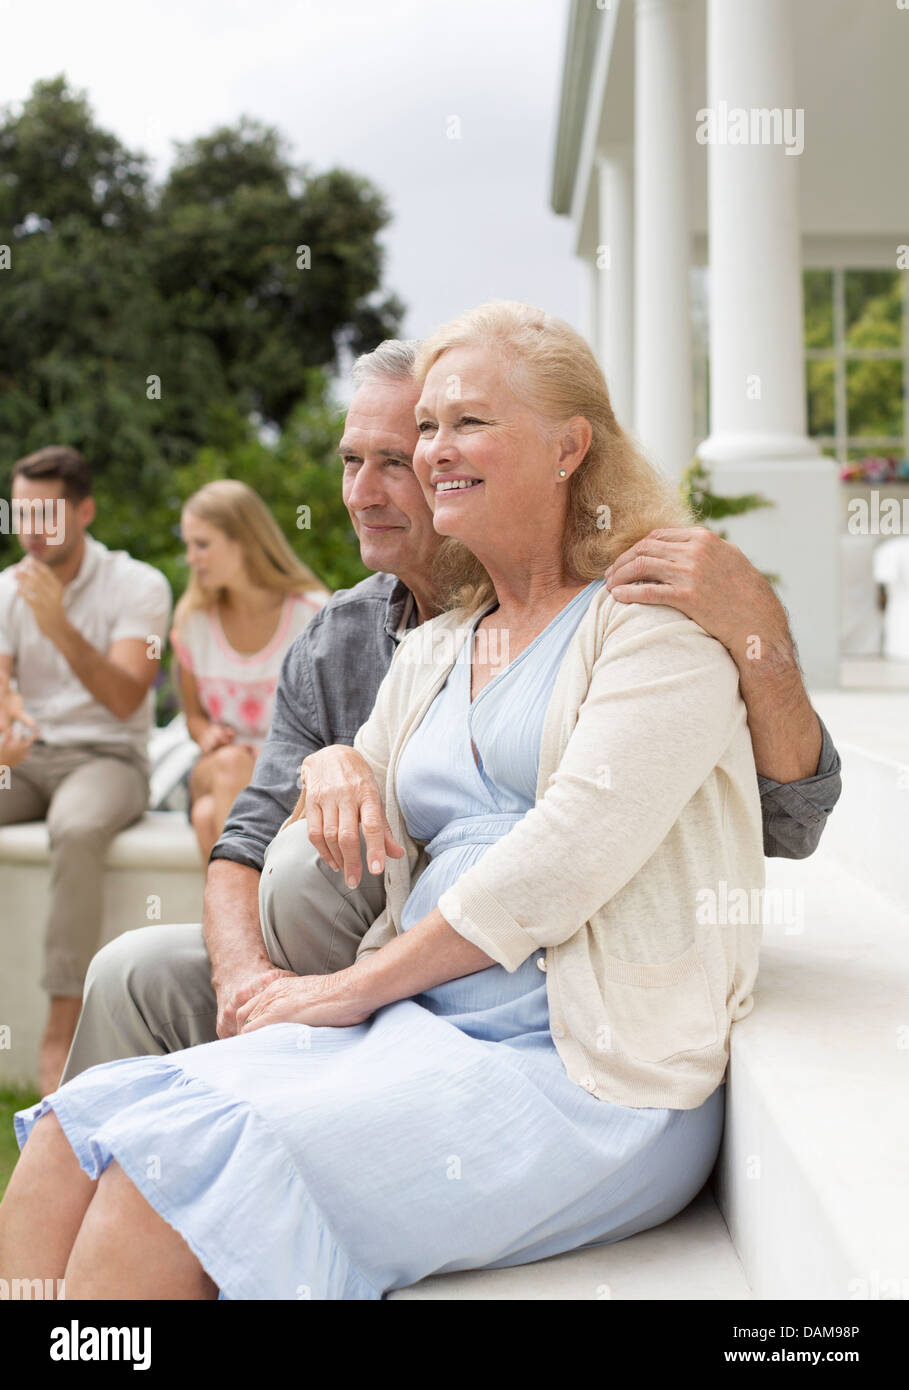 Älteres Ehepaar auf Veranda Stockbild